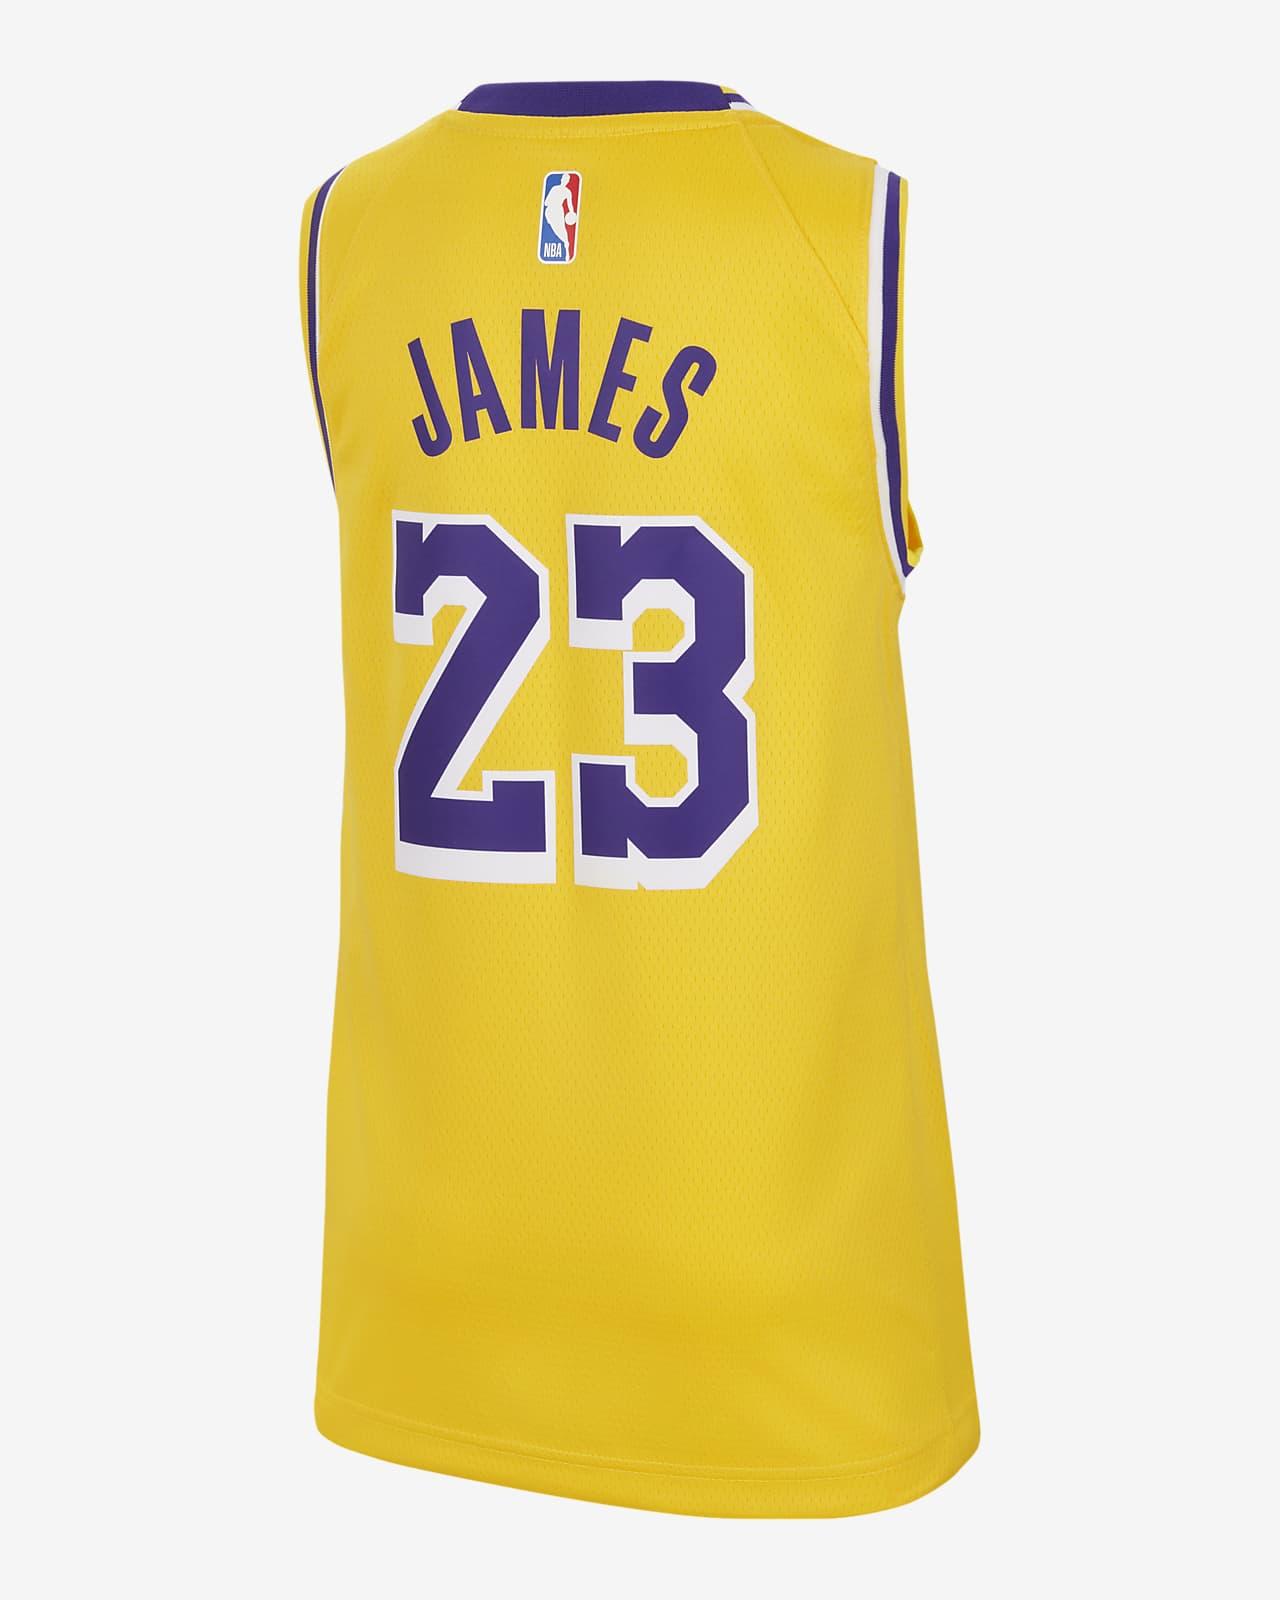 Atmungsaktive Und Abriebfeste Jungen M/änner Fans Trikot Basketballspieler-Trikot Angel ZYJ Lebron James Trikot NO.23 Retro Lakers